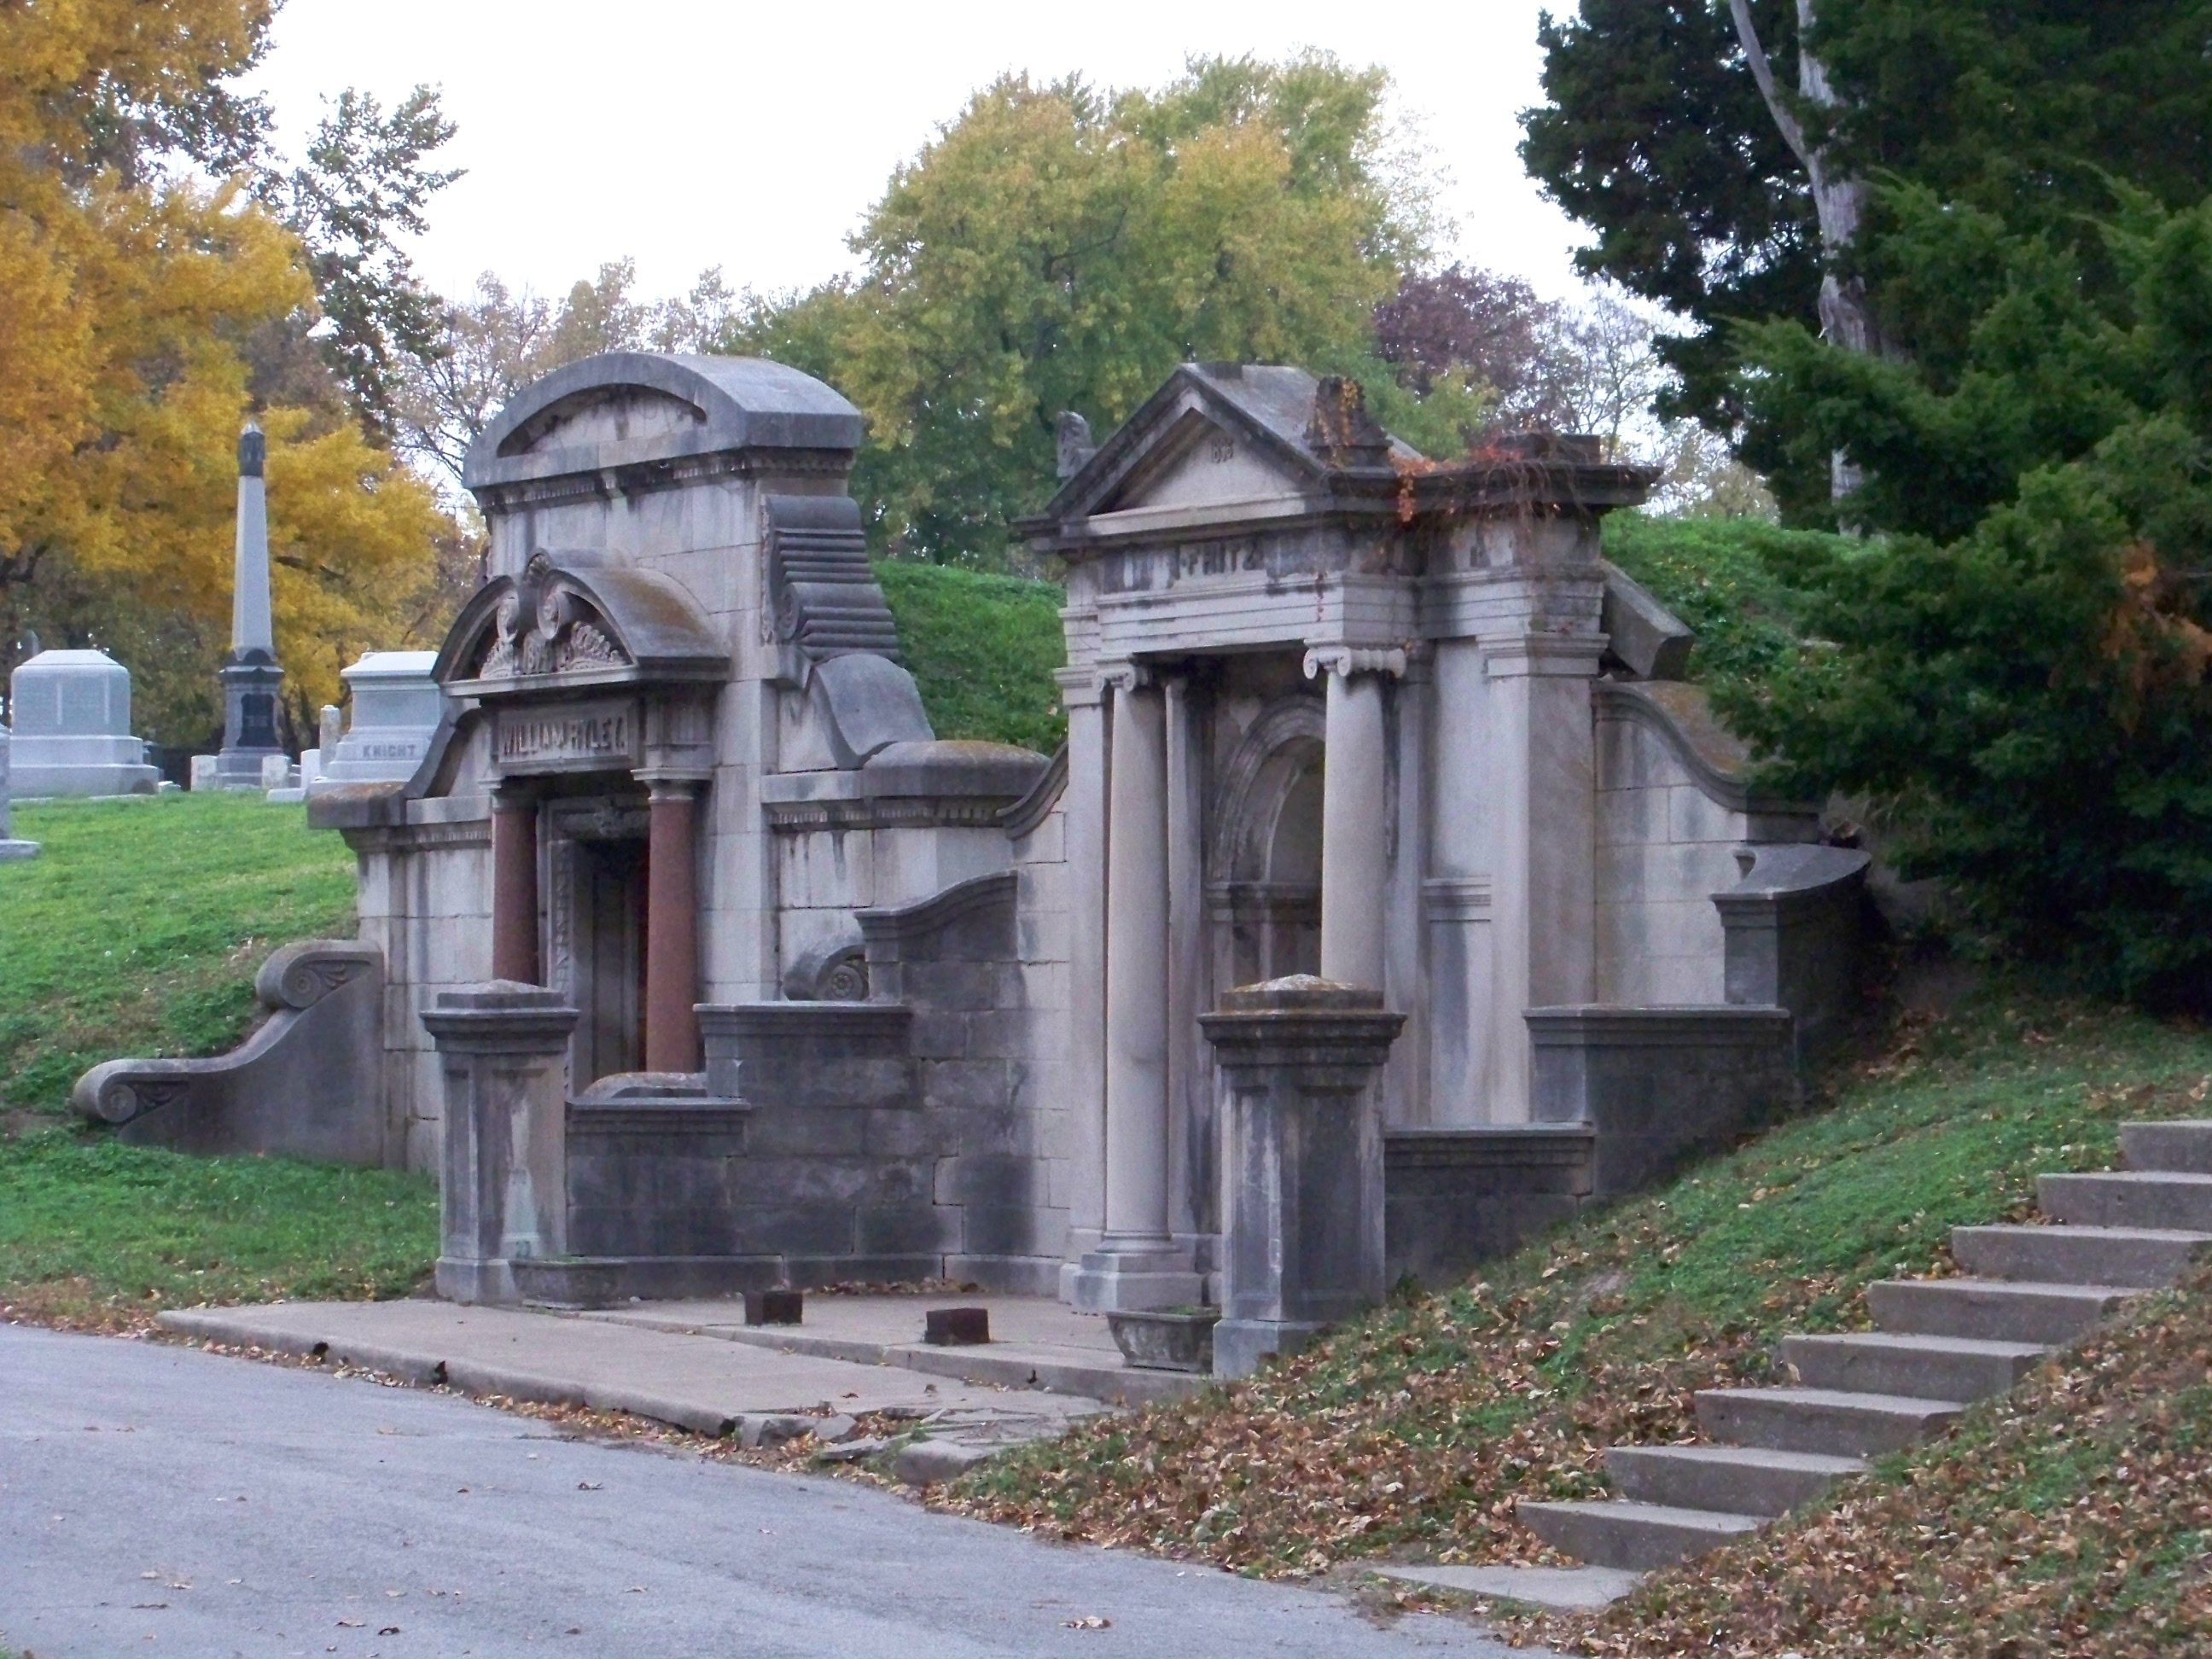 Mausoleum at Elmwood Cemetery in Kansas City Missouri